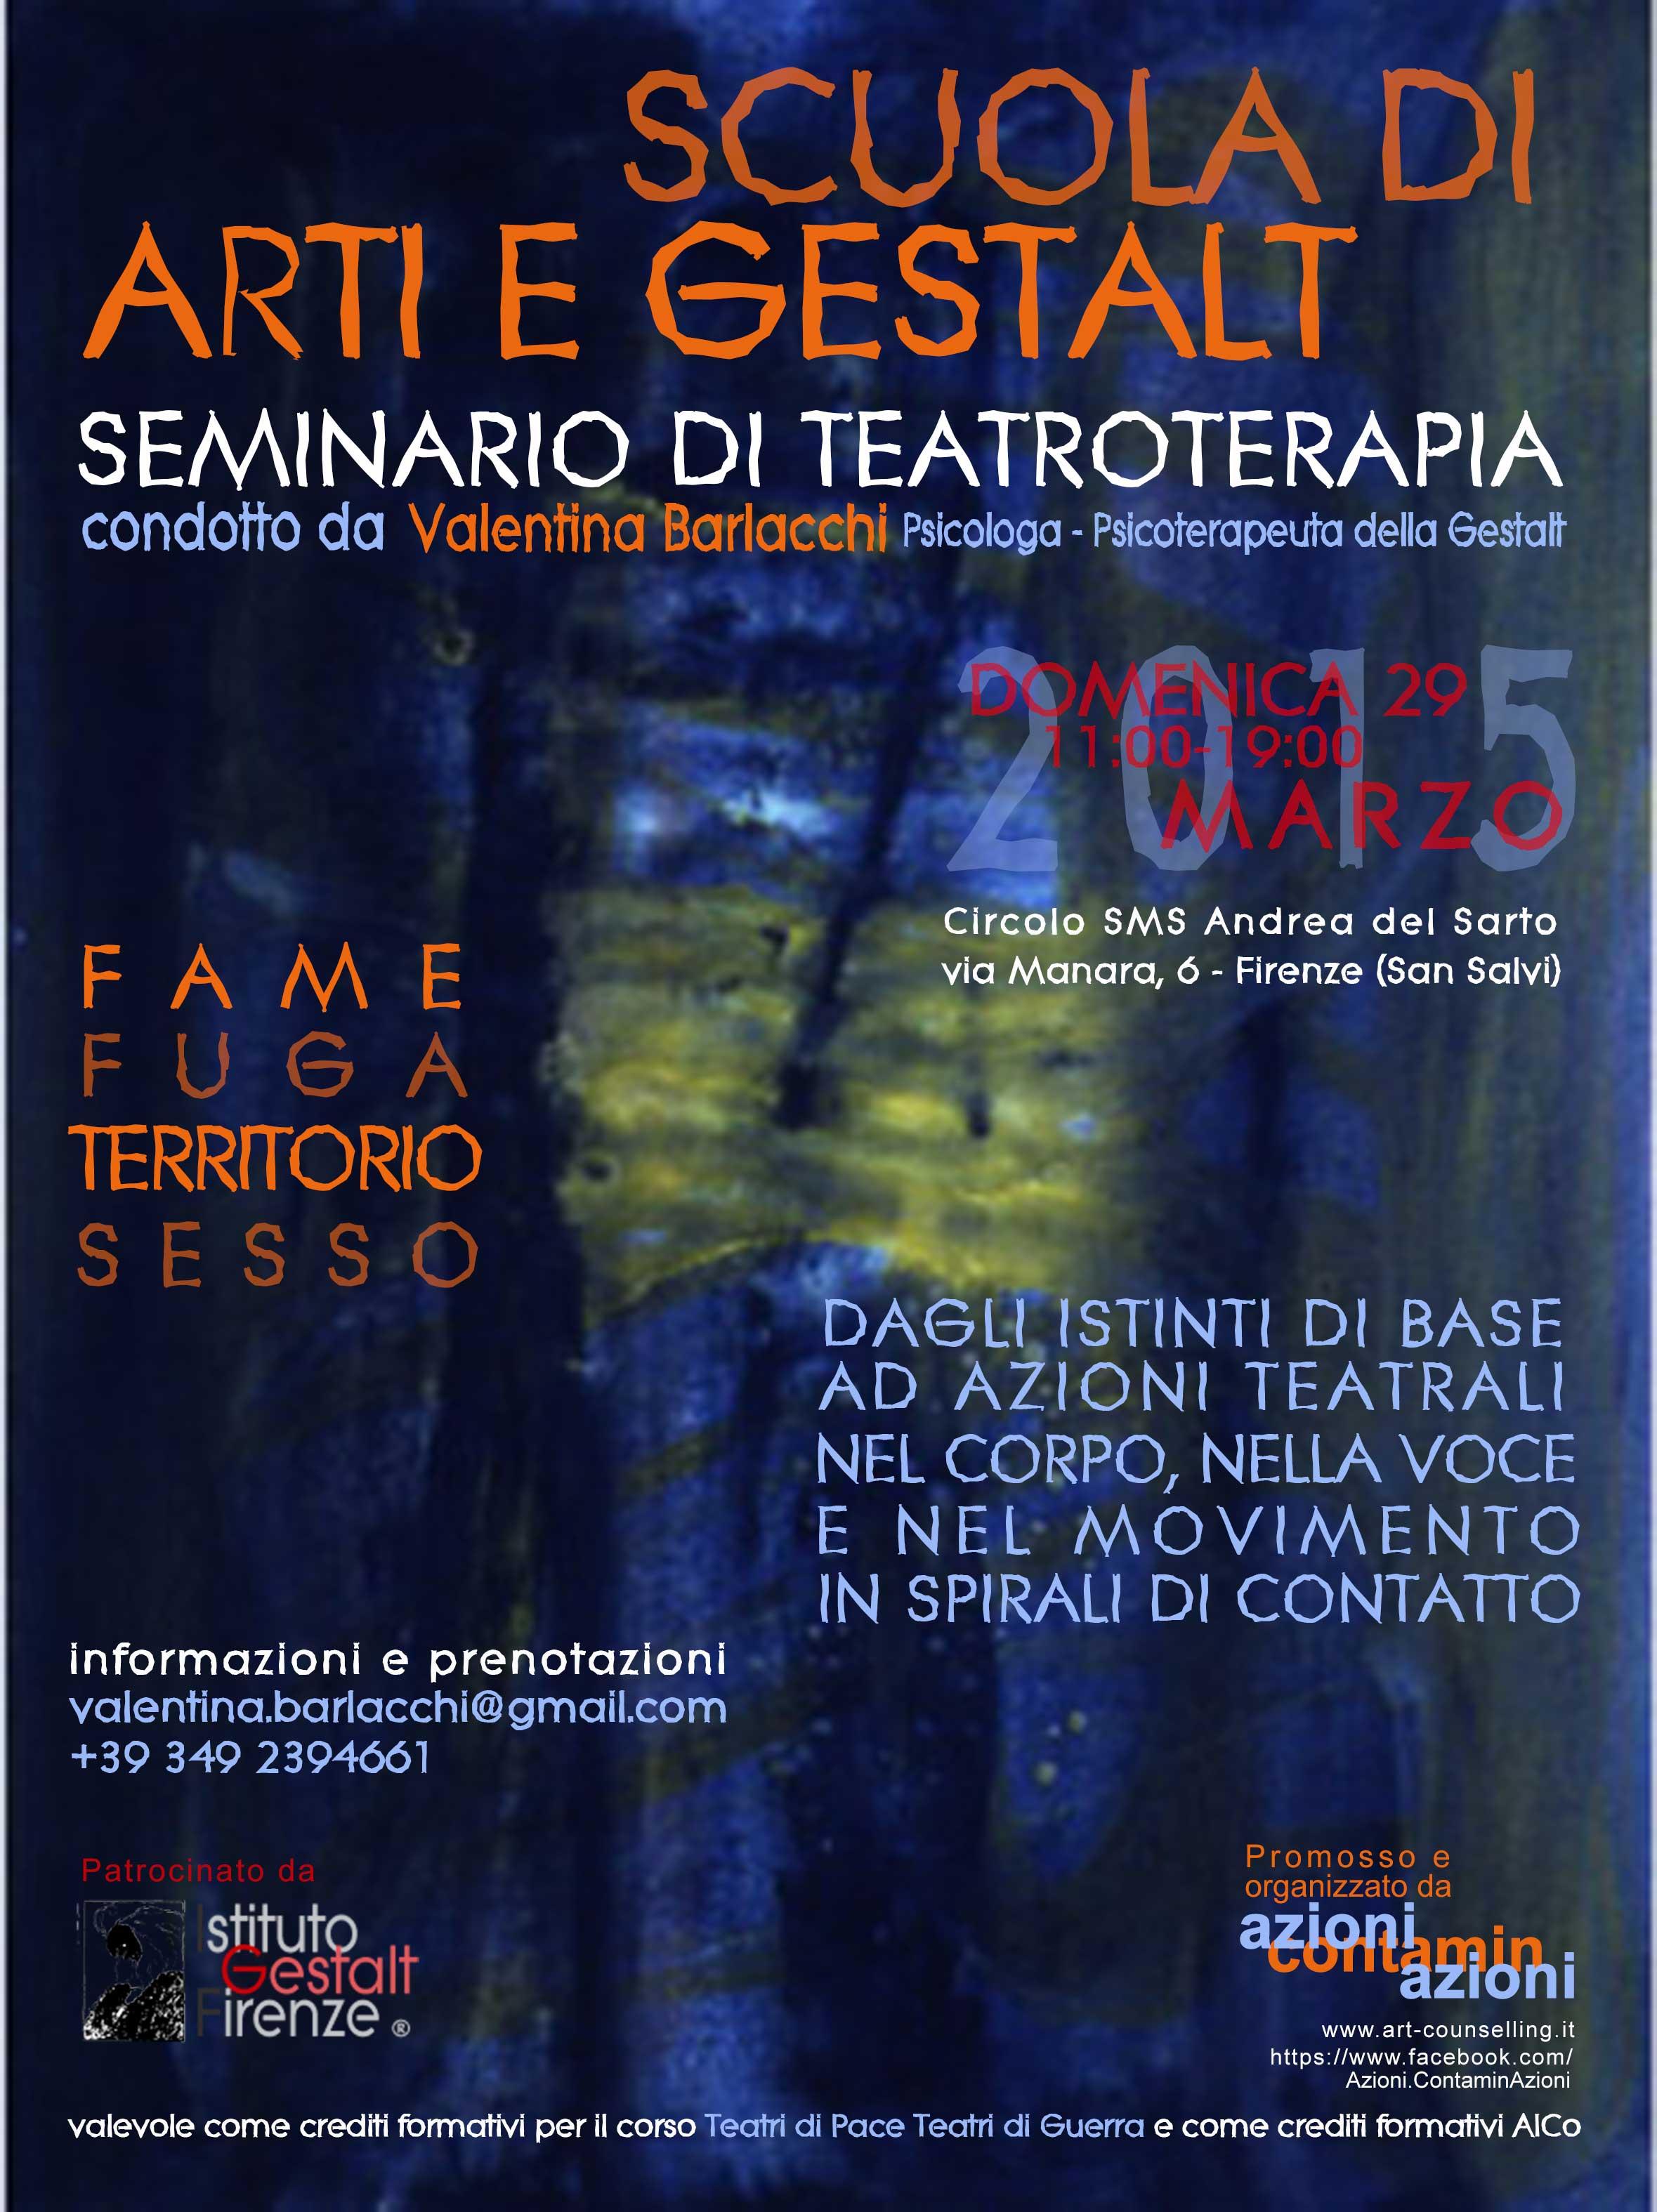 Seminario-Teatroterapia-29-03-2015